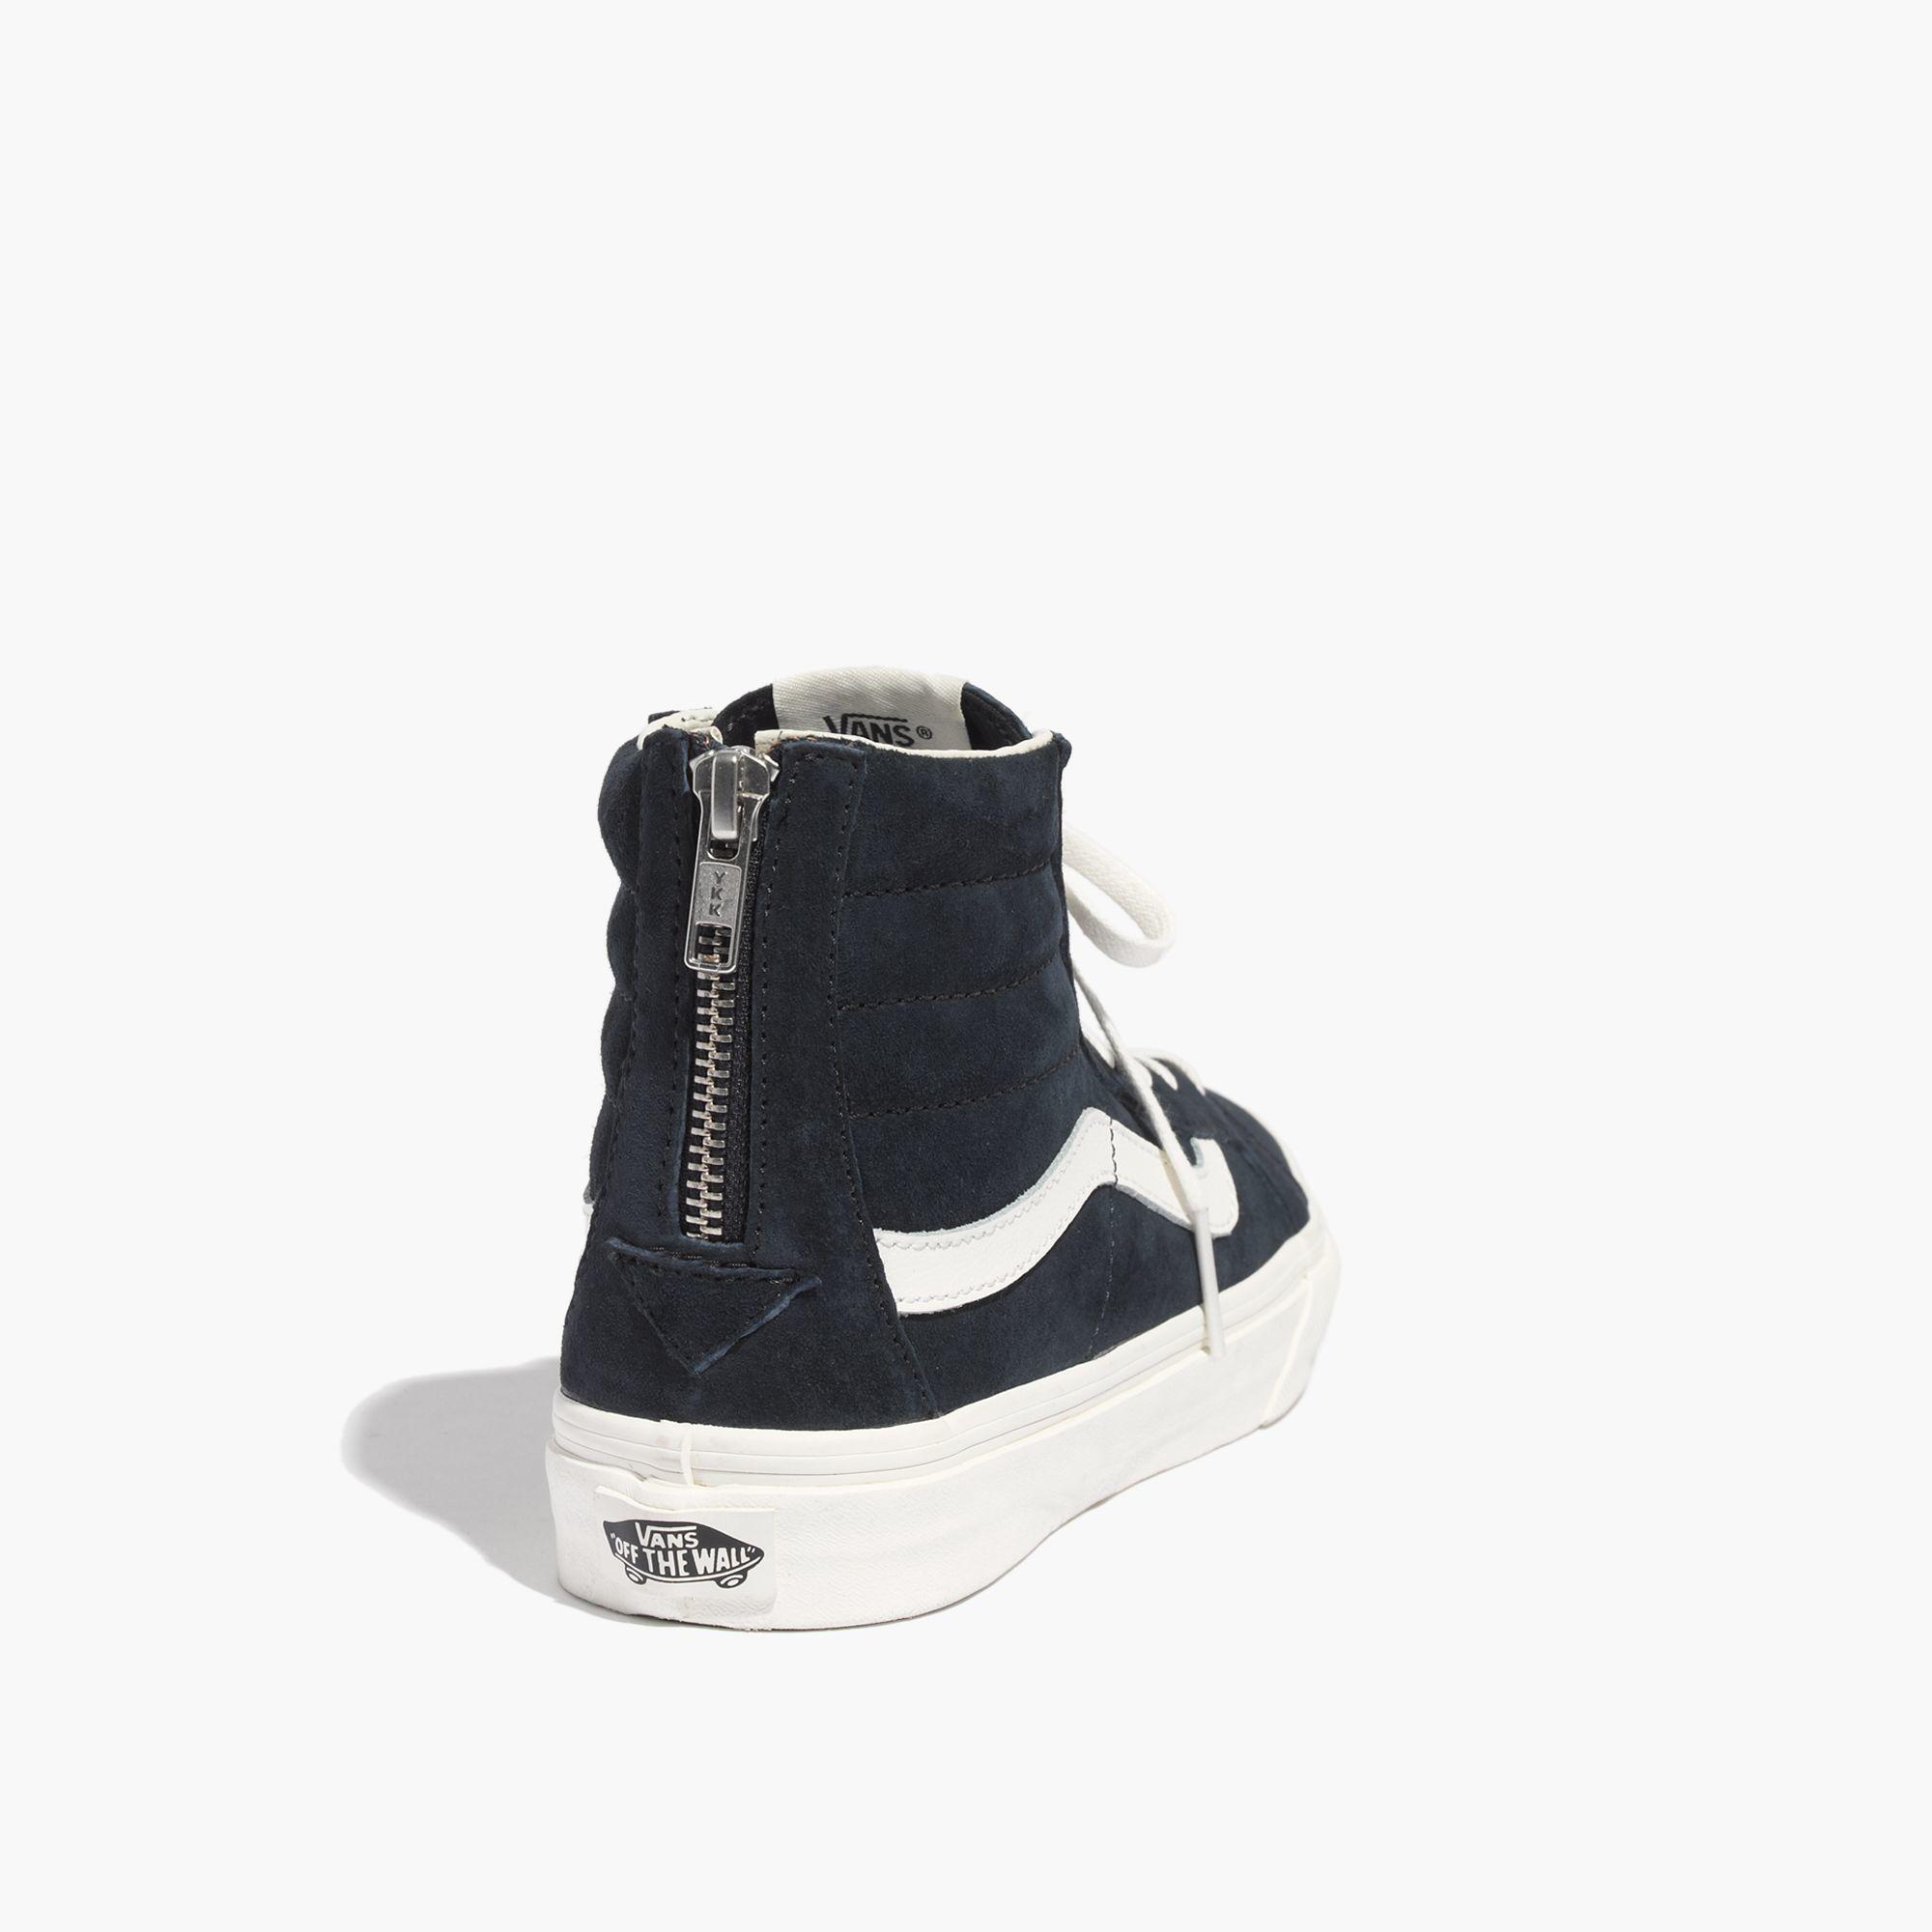 c920e510b39a74 Lyst - Madewell Vans® Sk8-Hi Slim Zip High-Top Sneakers In Navy ...